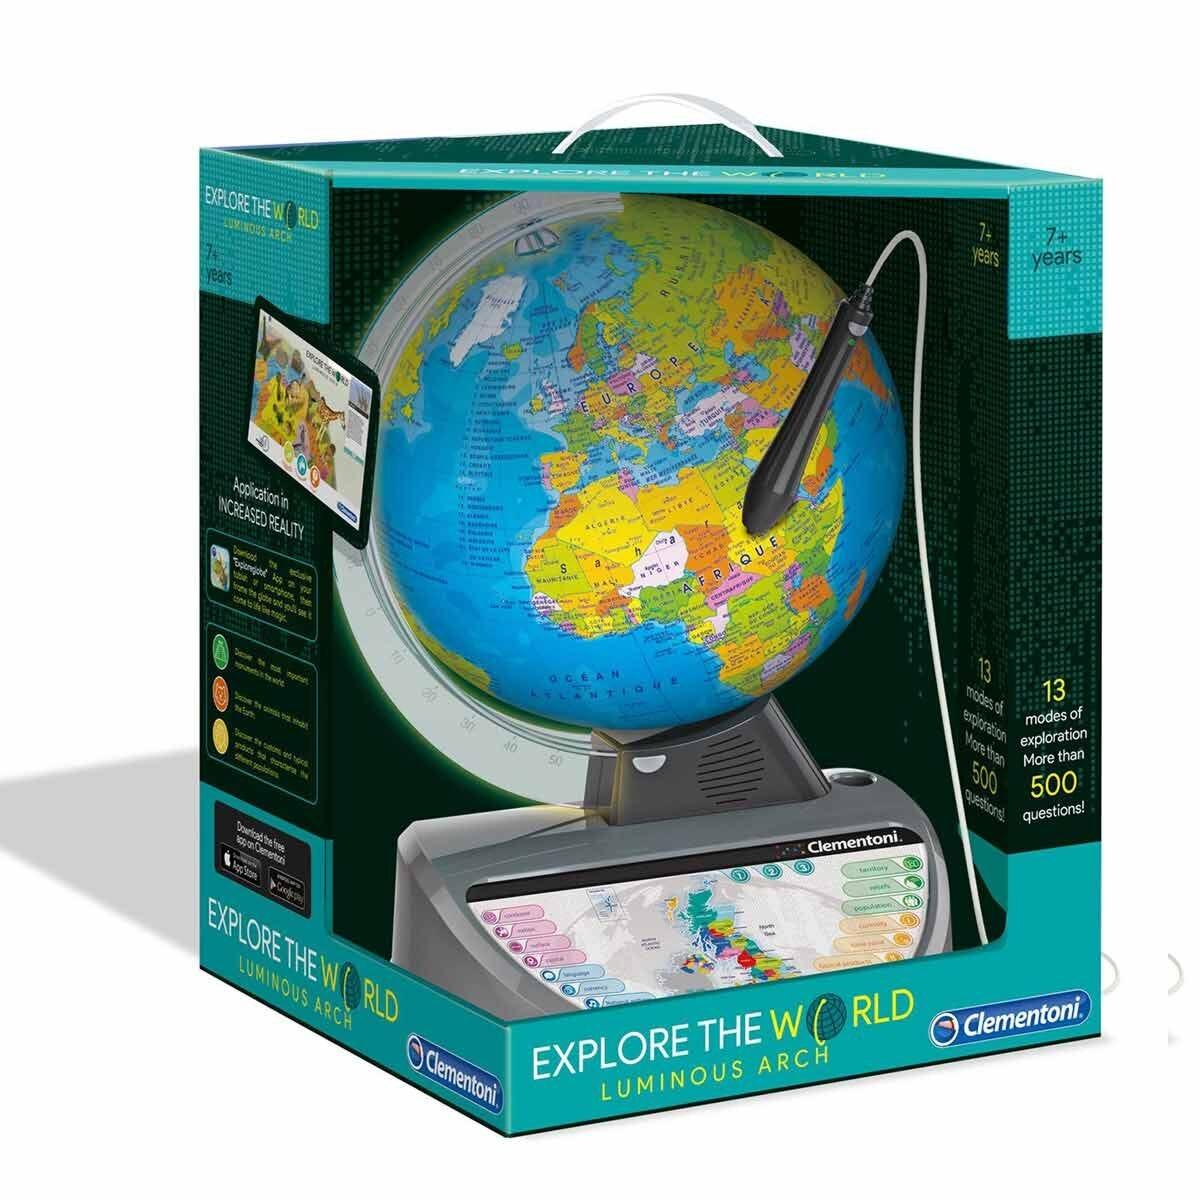 Clementoni Interactive Educational Globe